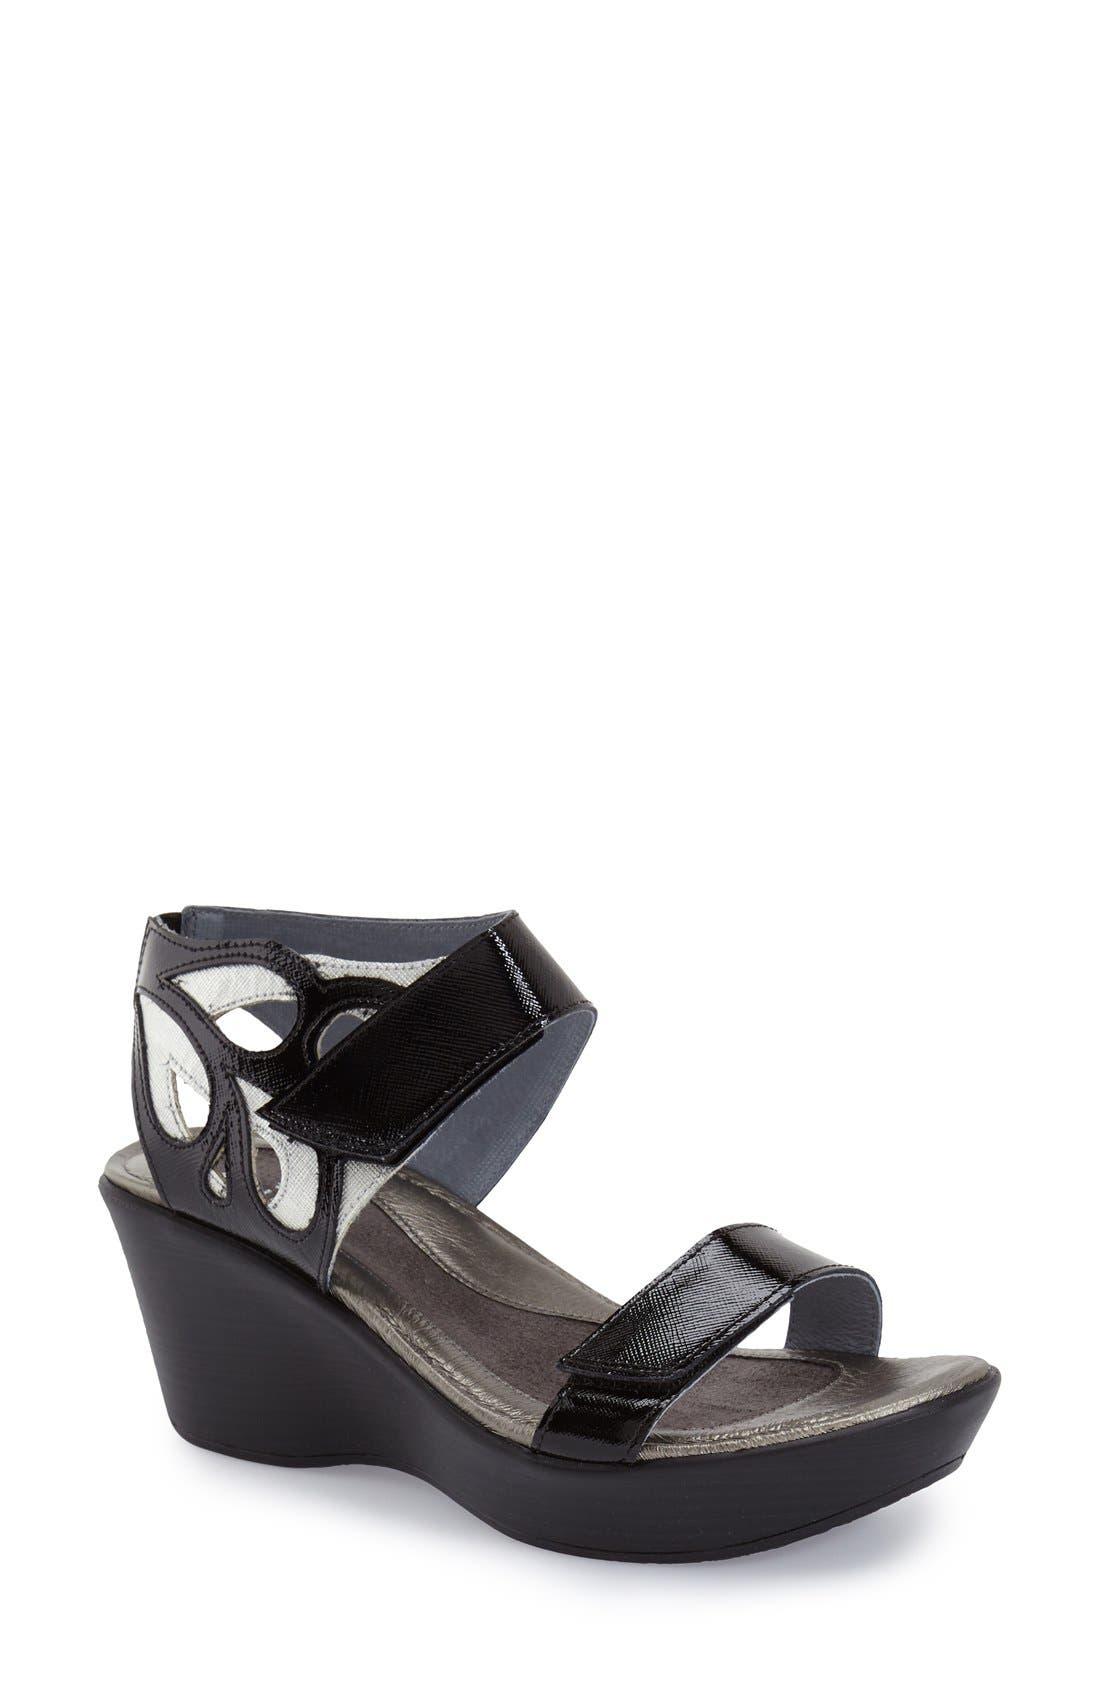 'Intrigue' Platform Wedge,                         Main,                         color, Black Luster Leather